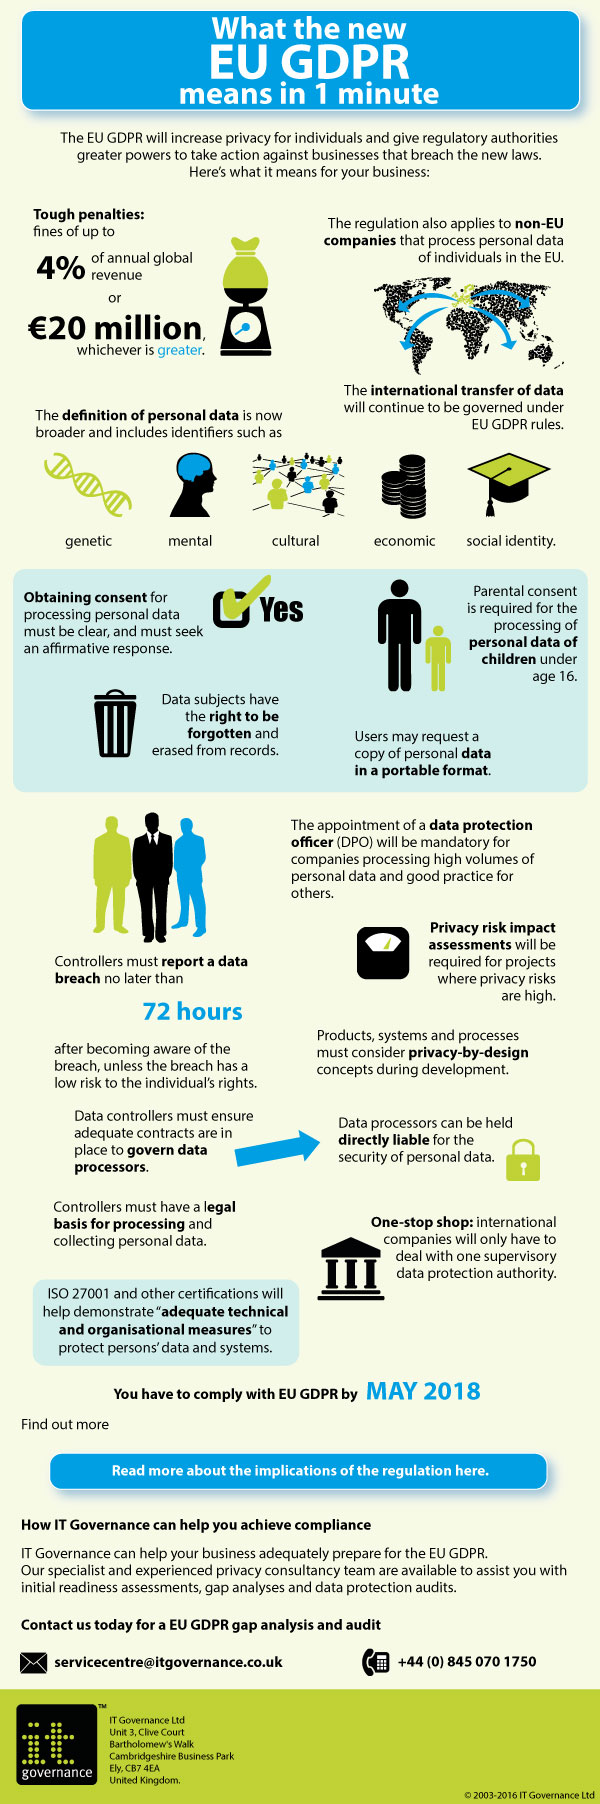 GDPR Infographic